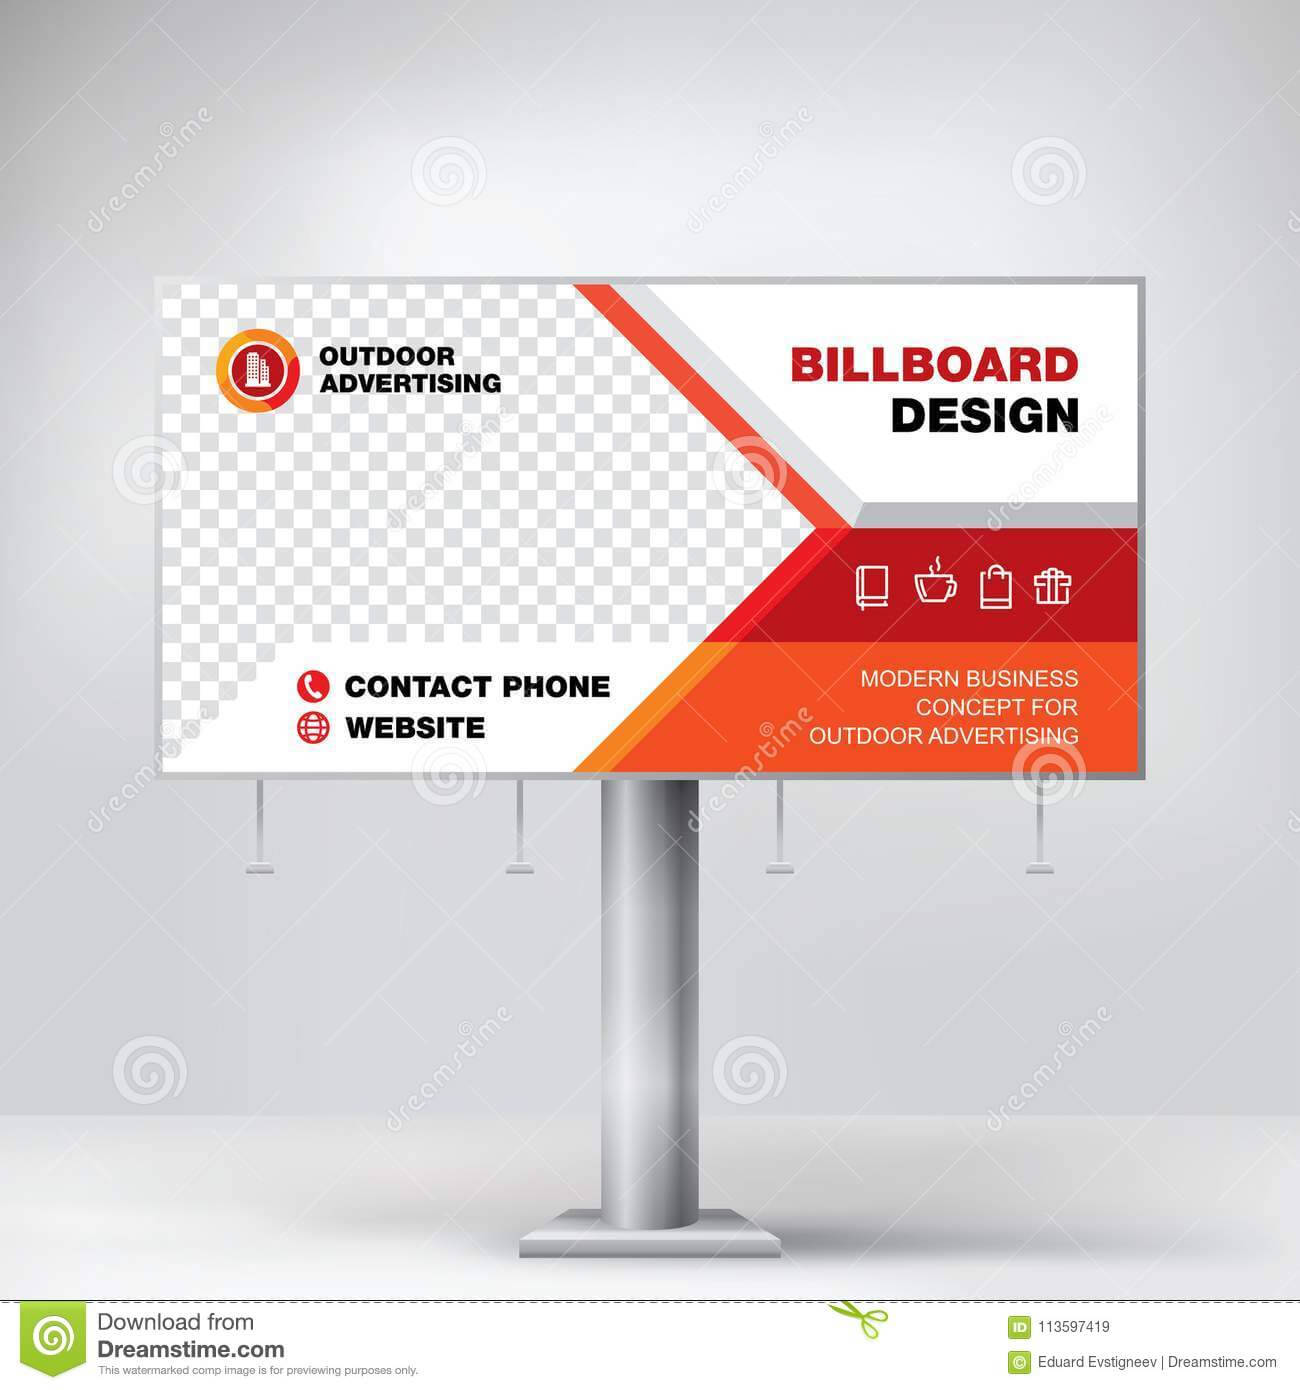 Billboard Design, Template Banner For Outdoor Advertising with Outdoor Banner Design Templates